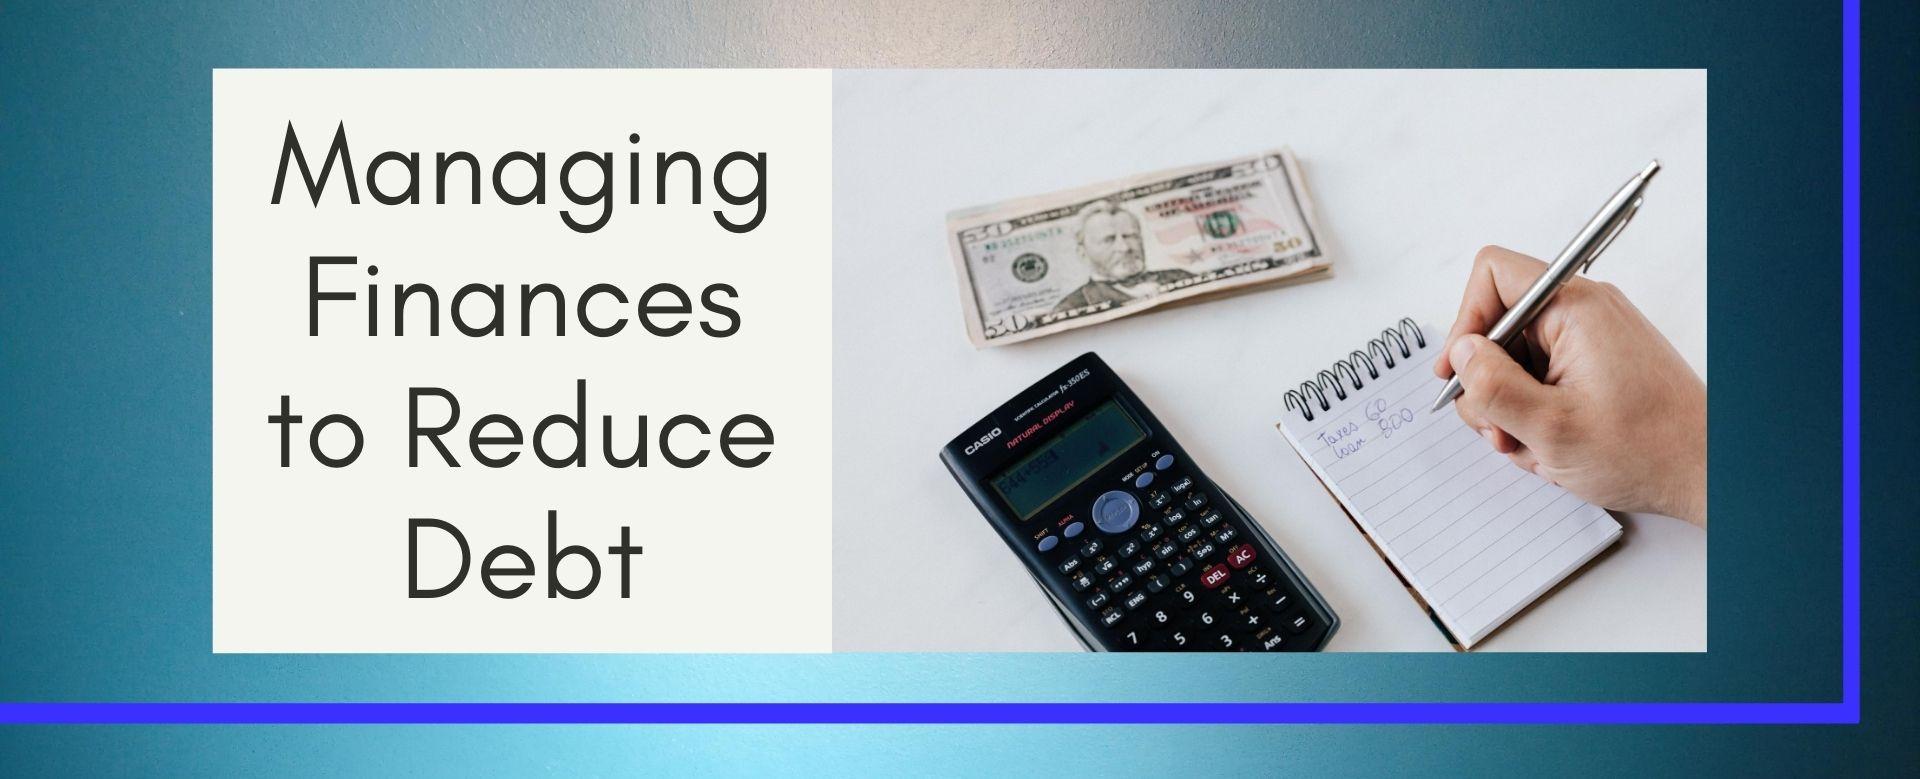 Managing Finances to Reduce Debt